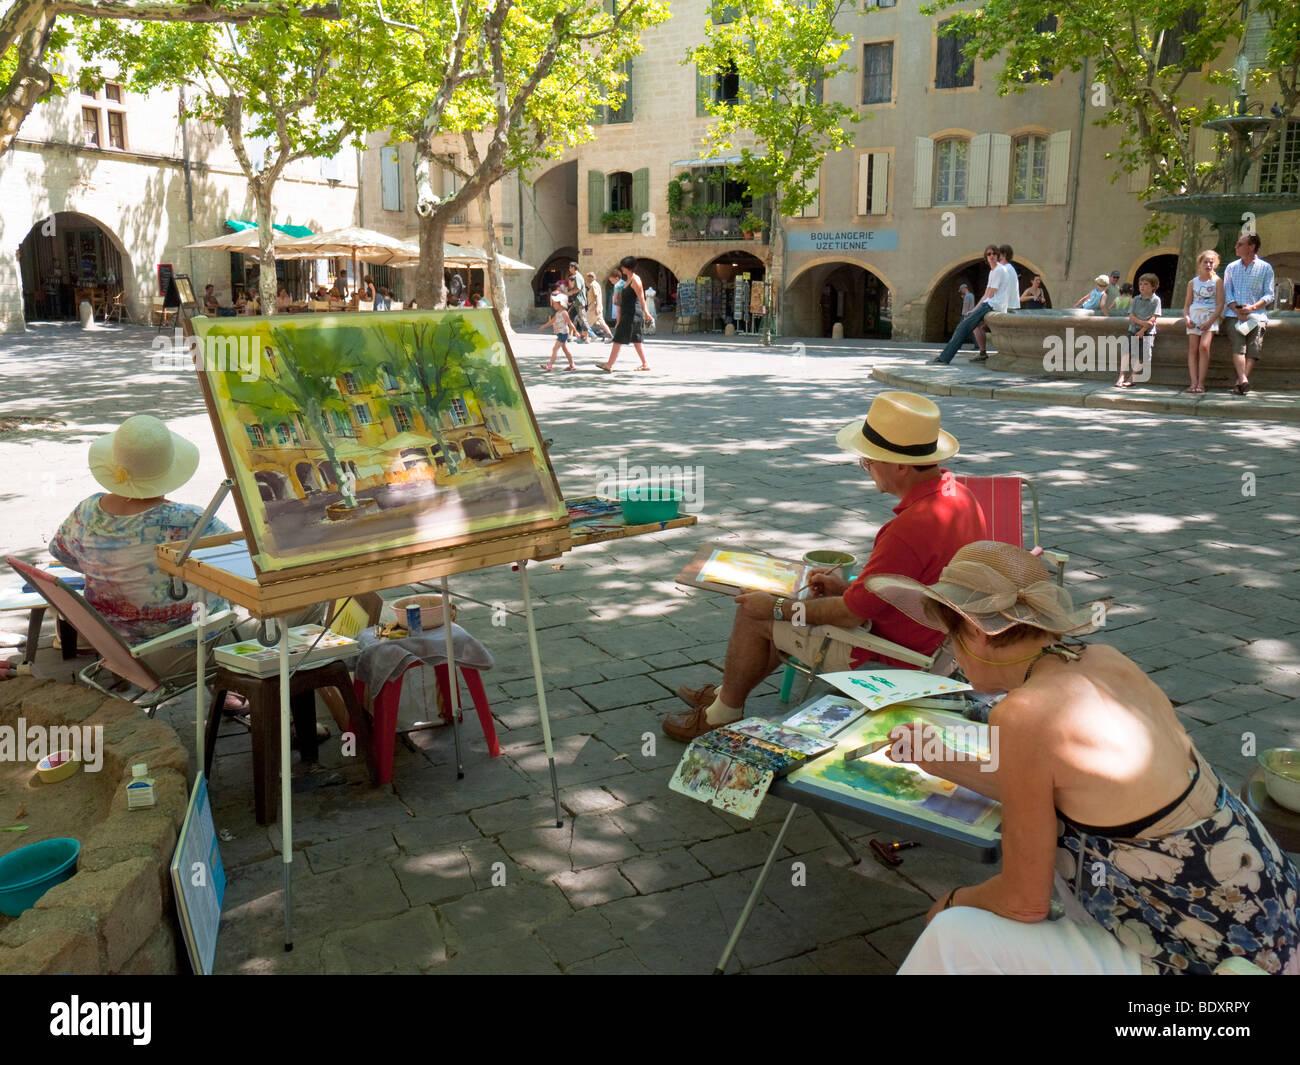 Hobby pintores trabajan en la plaza central Place aux Herbes en Uzès, en el sur de Francia. Imagen De Stock